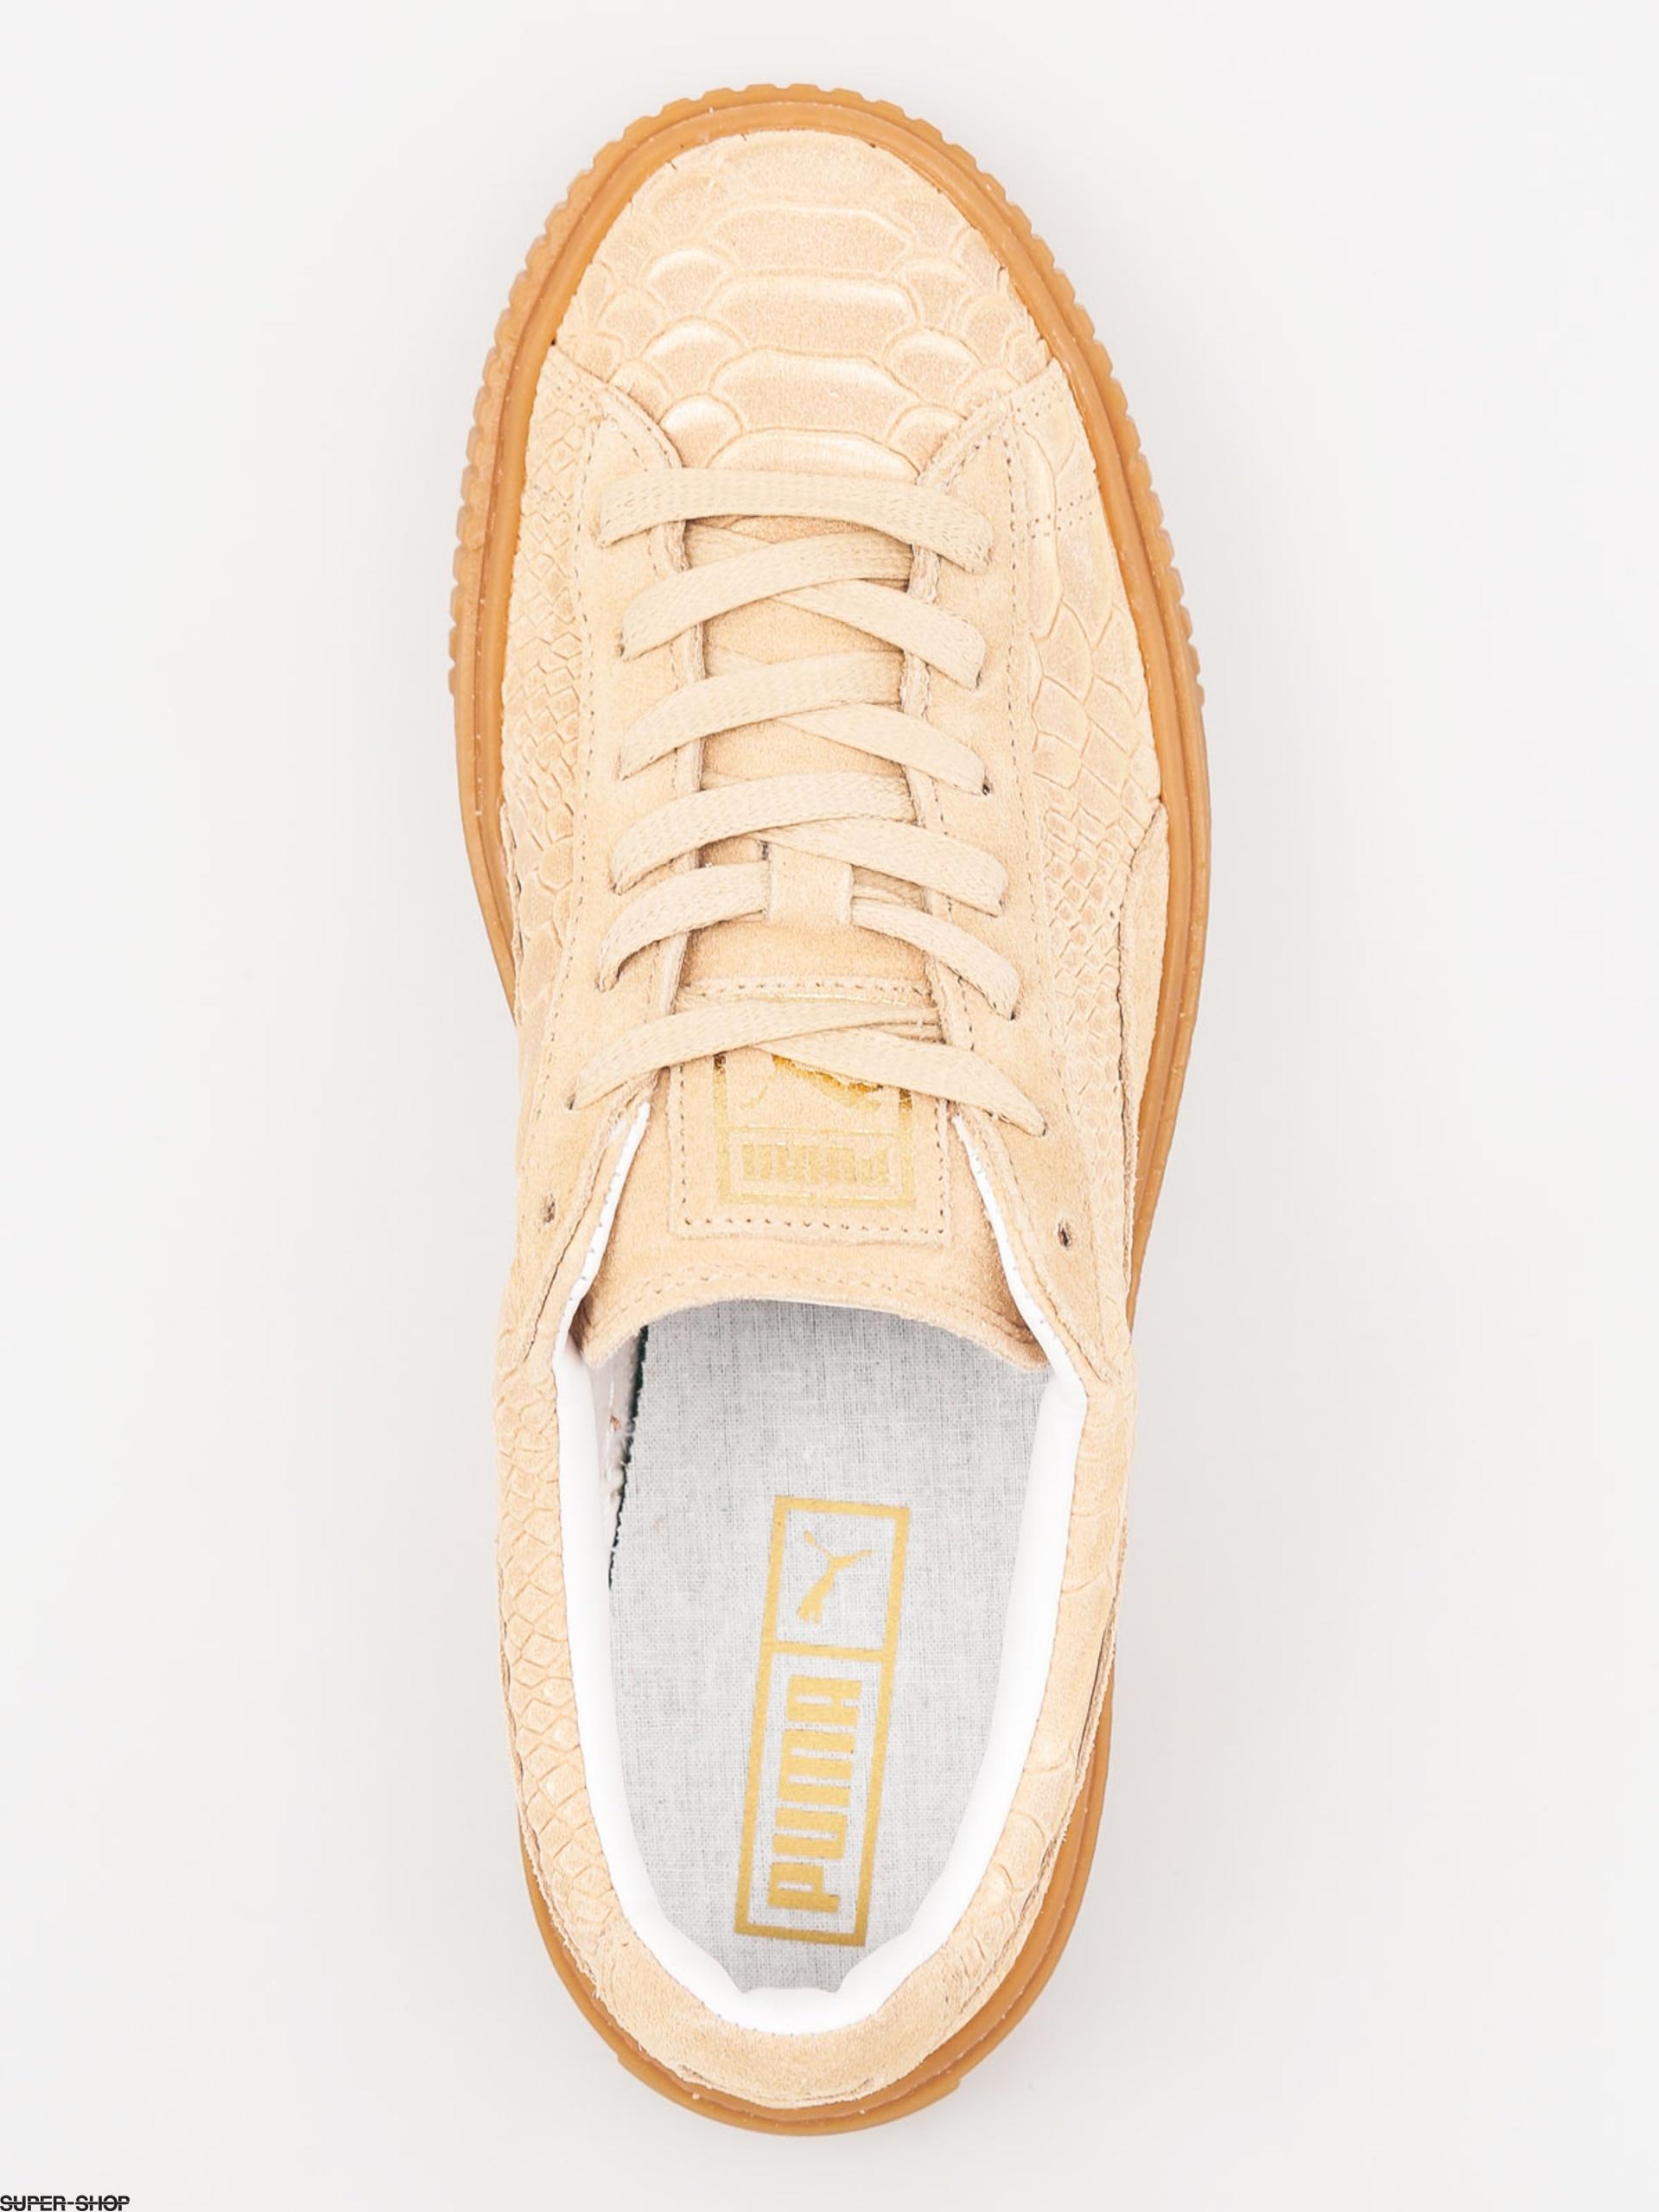 new arrival fcf05 2ef02 837907-w1920-puma-schuhe-basket-platform-exotic-skin-wmn-natural-vachetta- gold.jpg